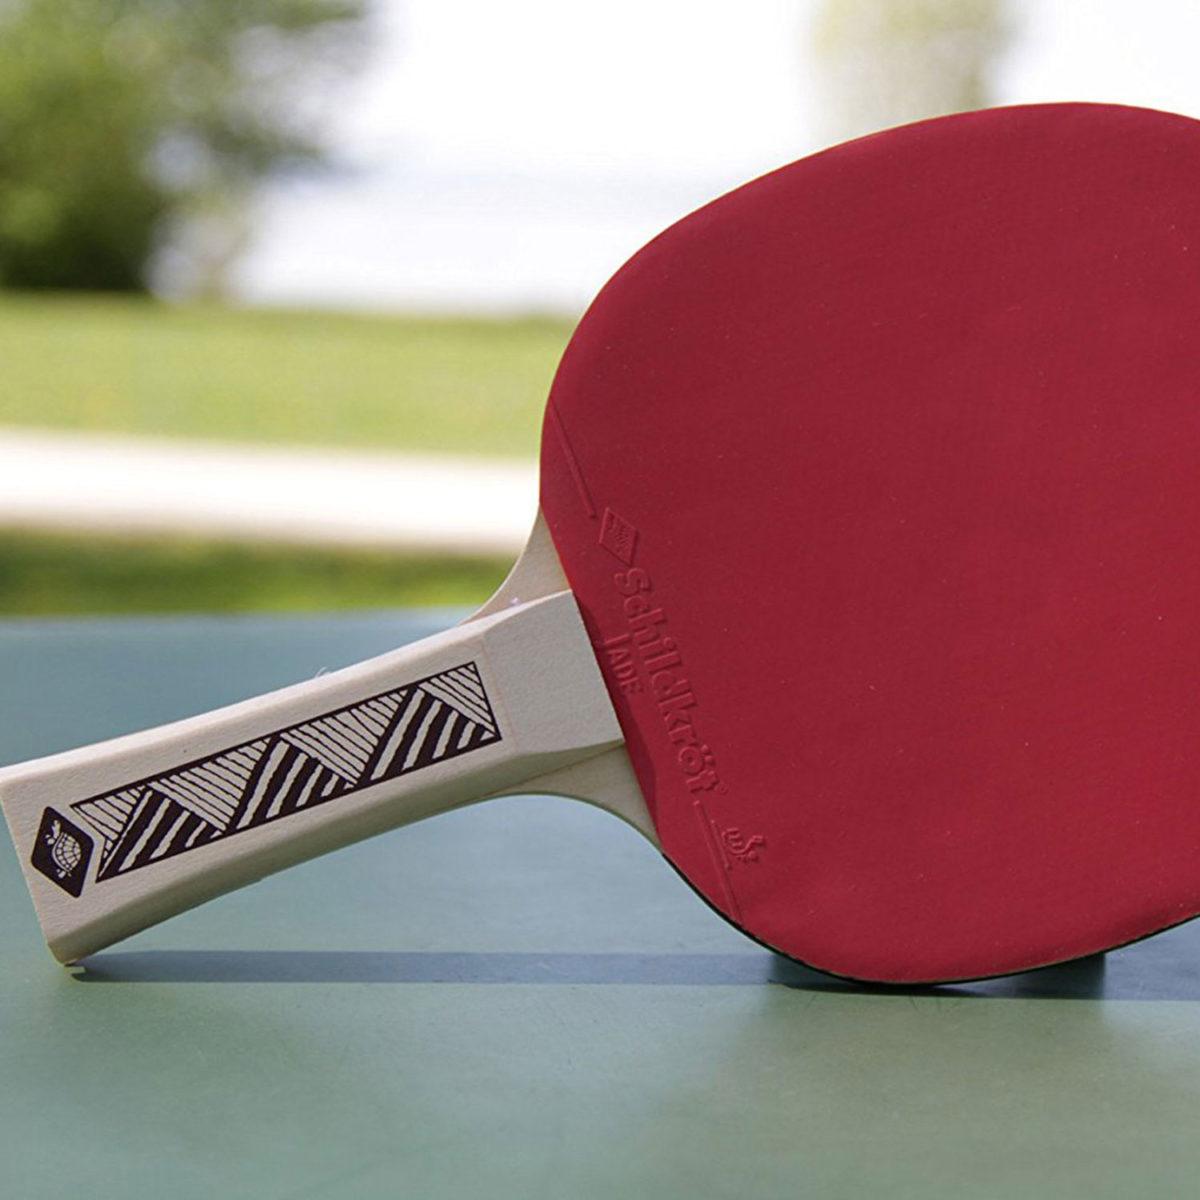 DONIC Champs 150 набор для настольного тенниса - 4